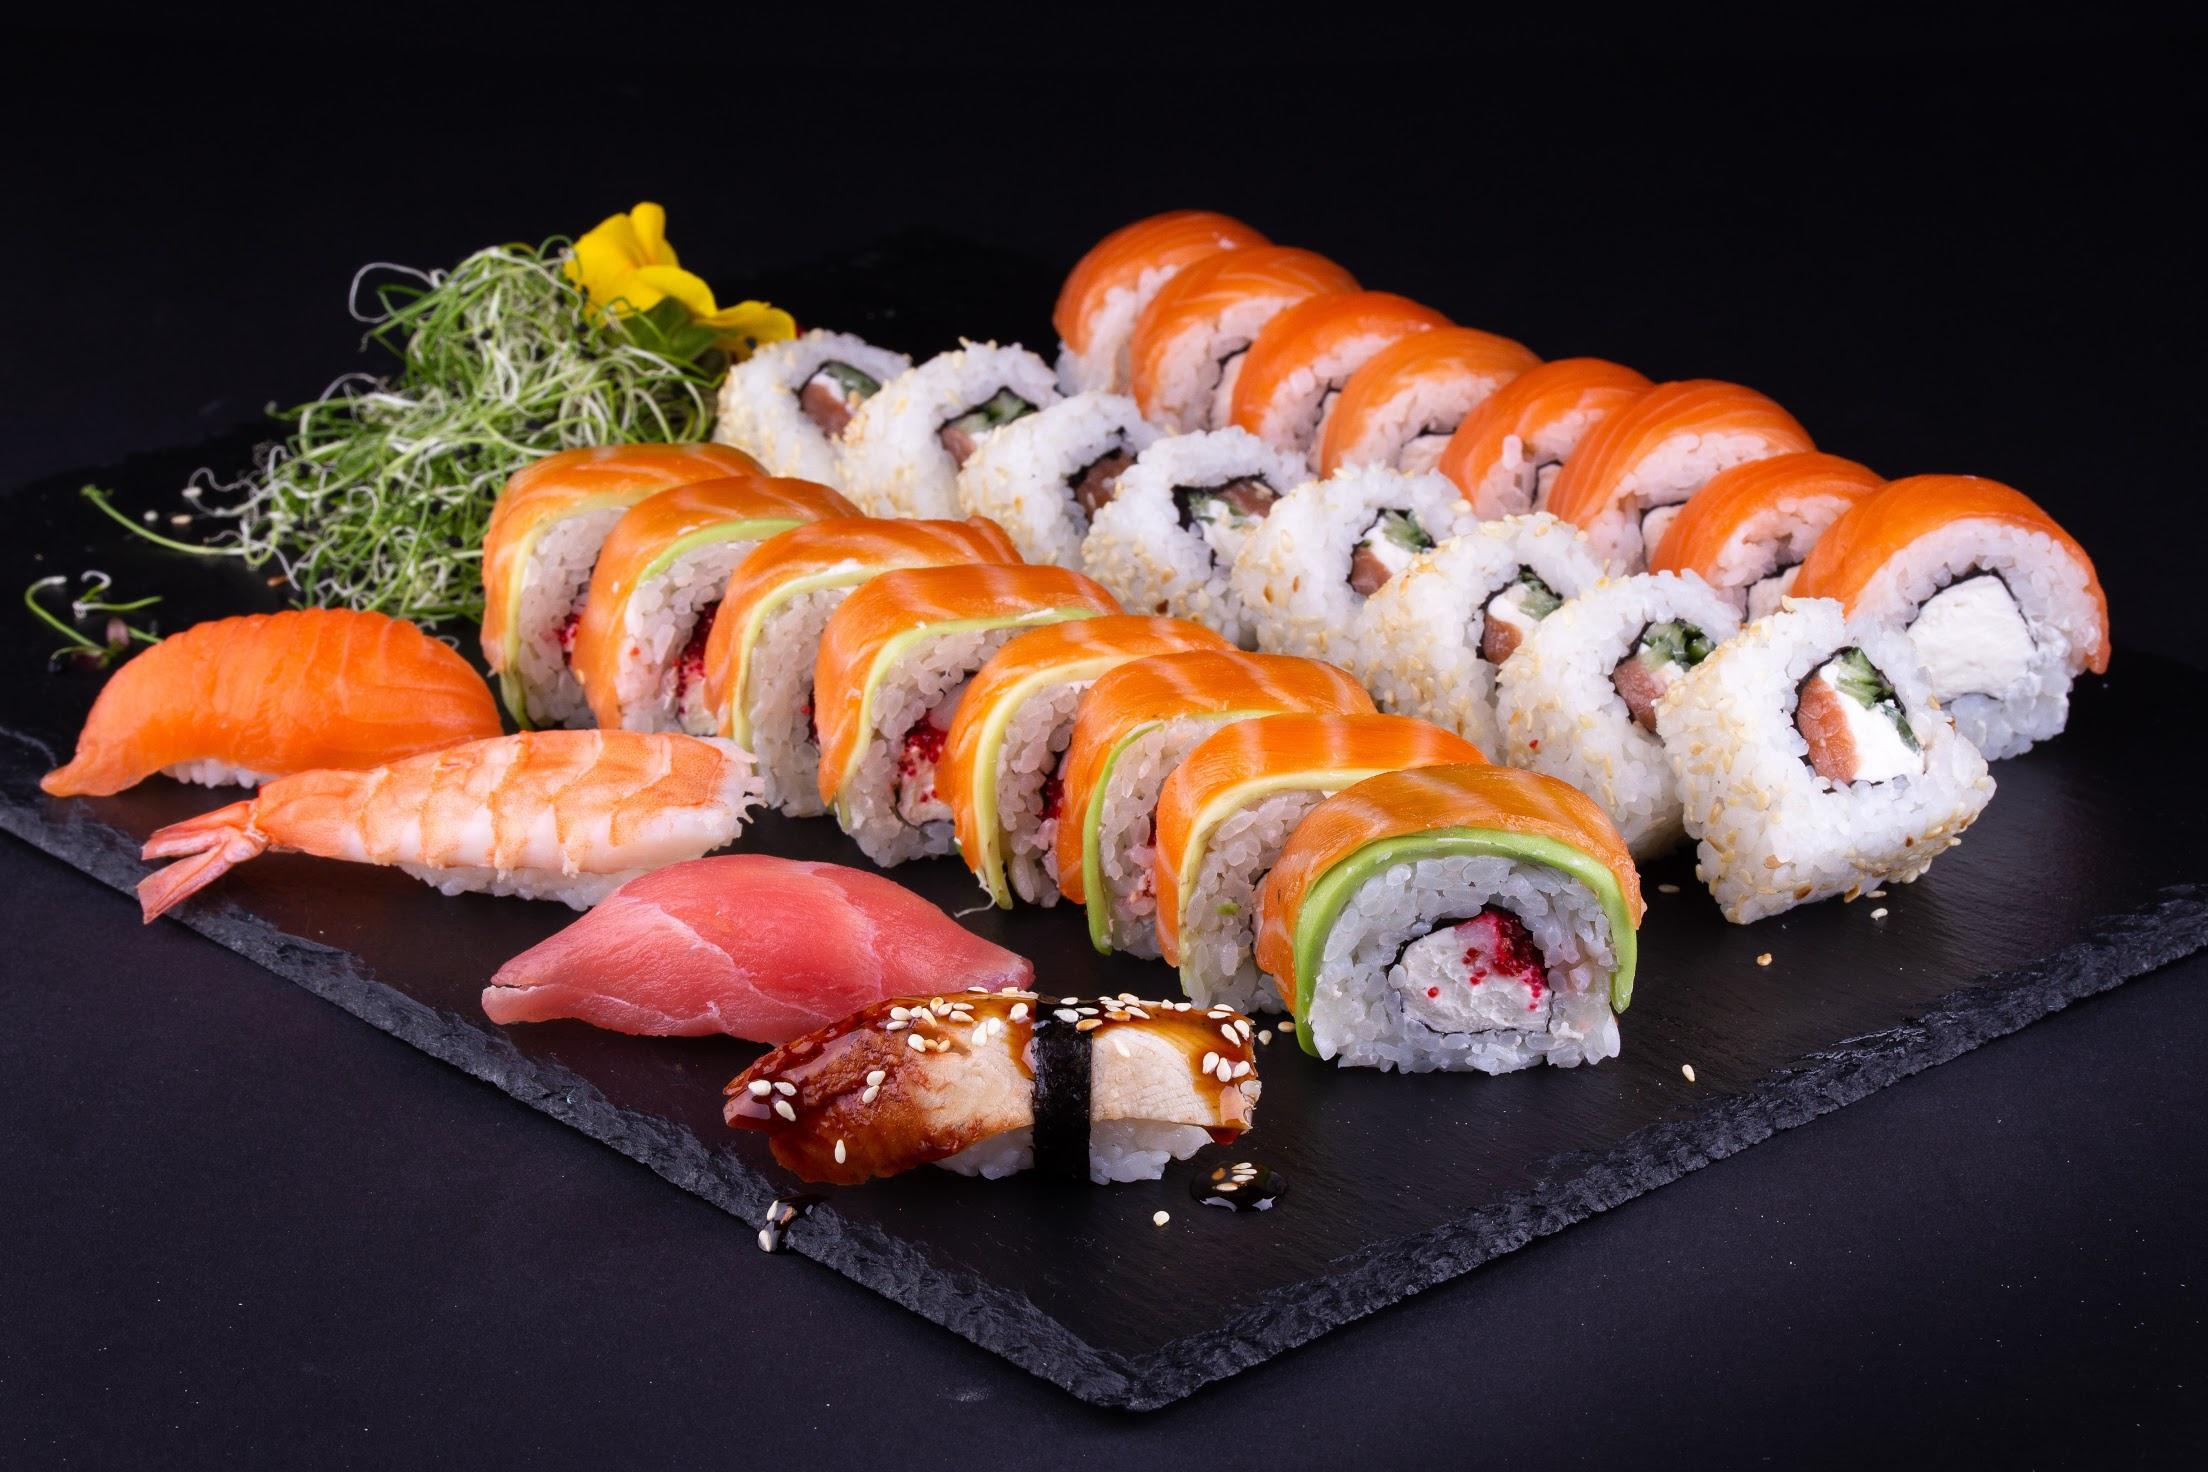 Fish Seafood Sushi Wallpaper   Resolution2208x1472   ID1169189 2208x1472